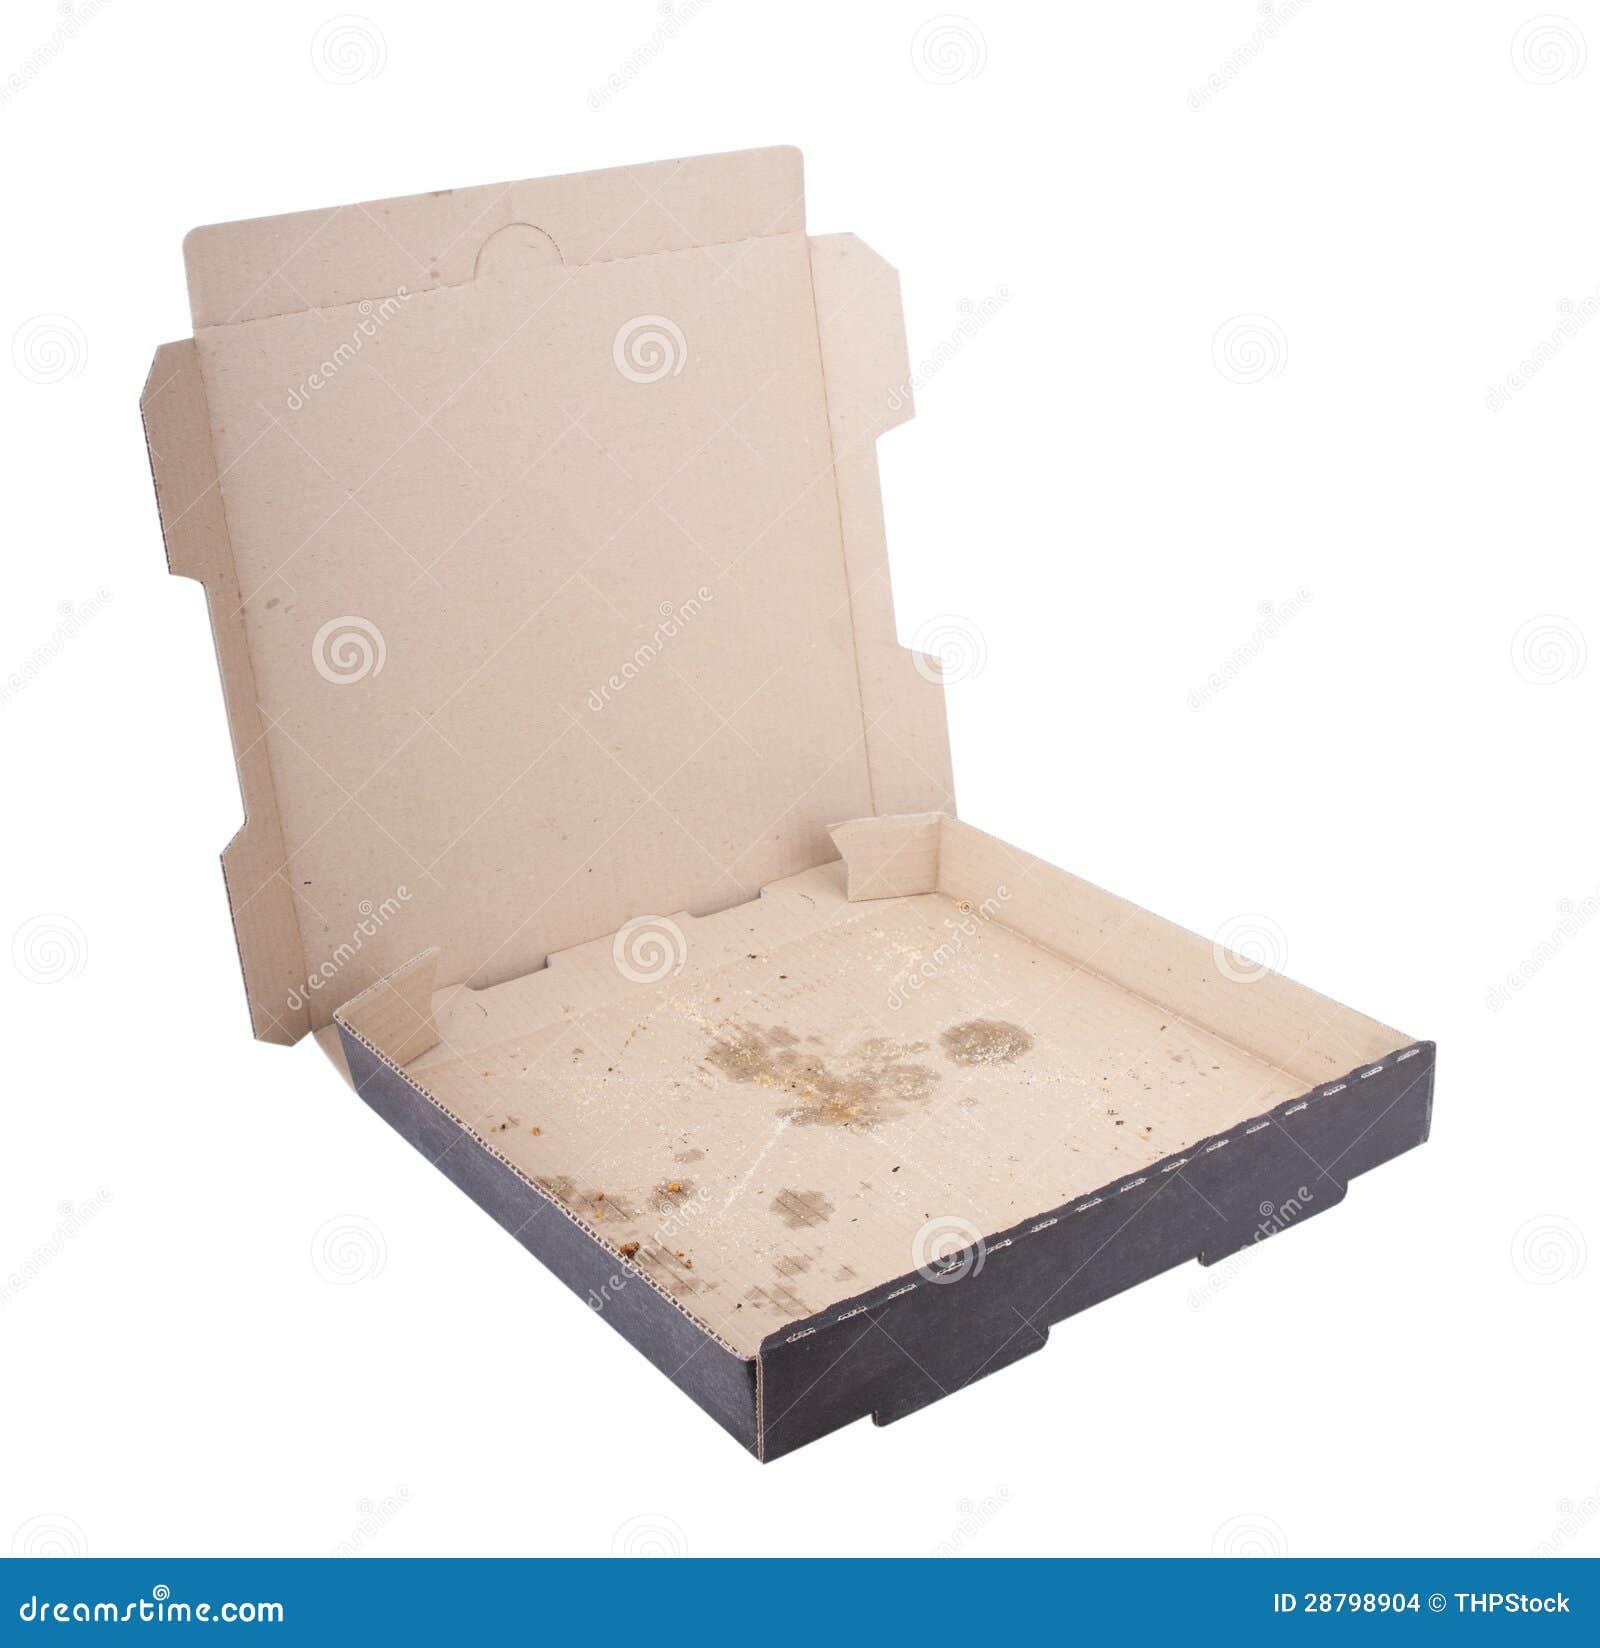 Empty Pizza Box Stock Images - Image: 28798904